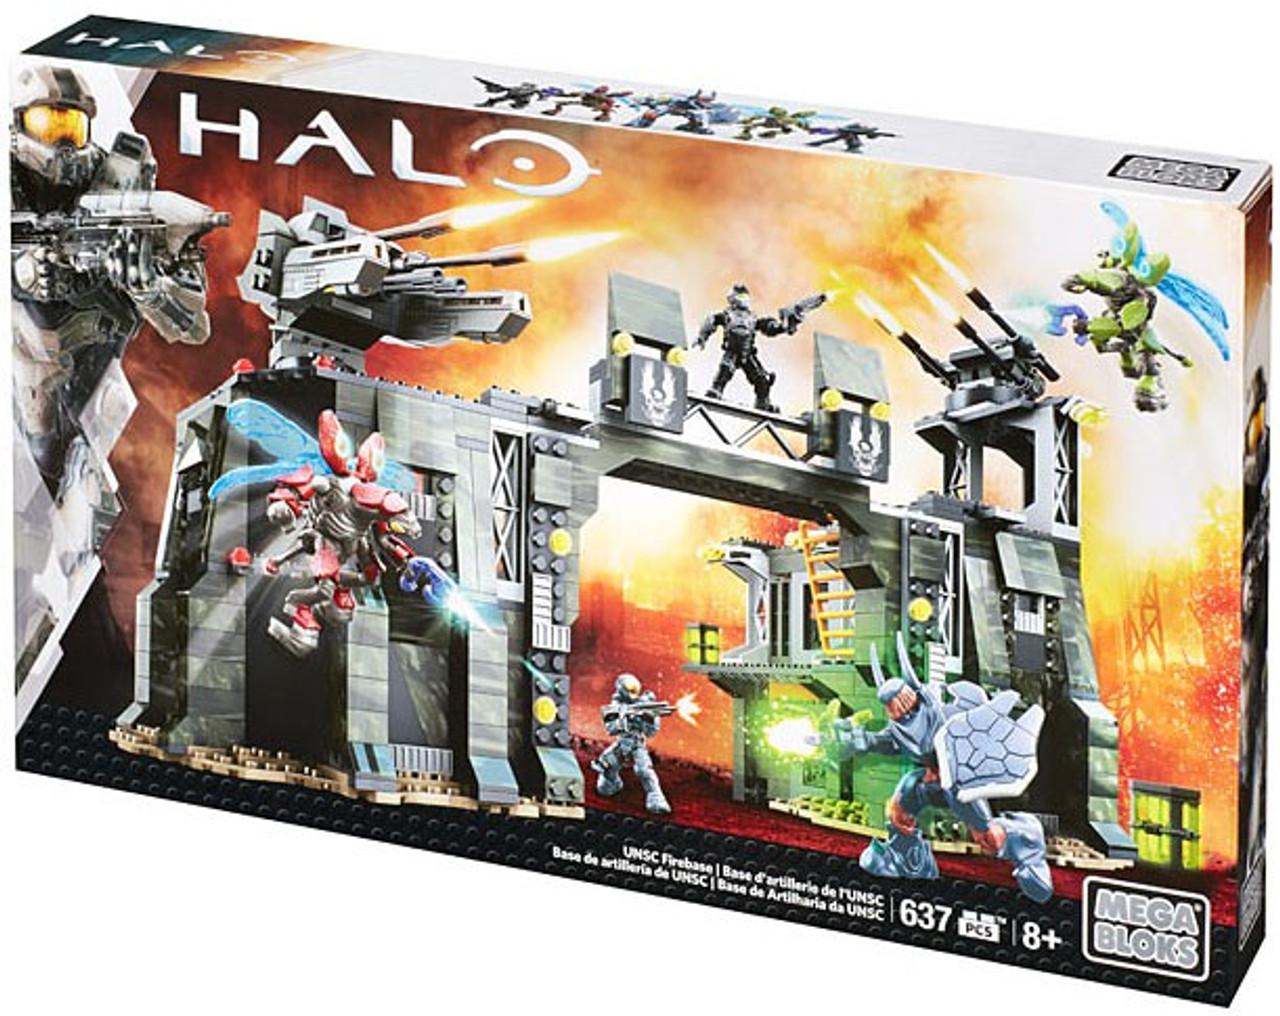 Mega Bloks Halo UNSC Firebase Set #38138